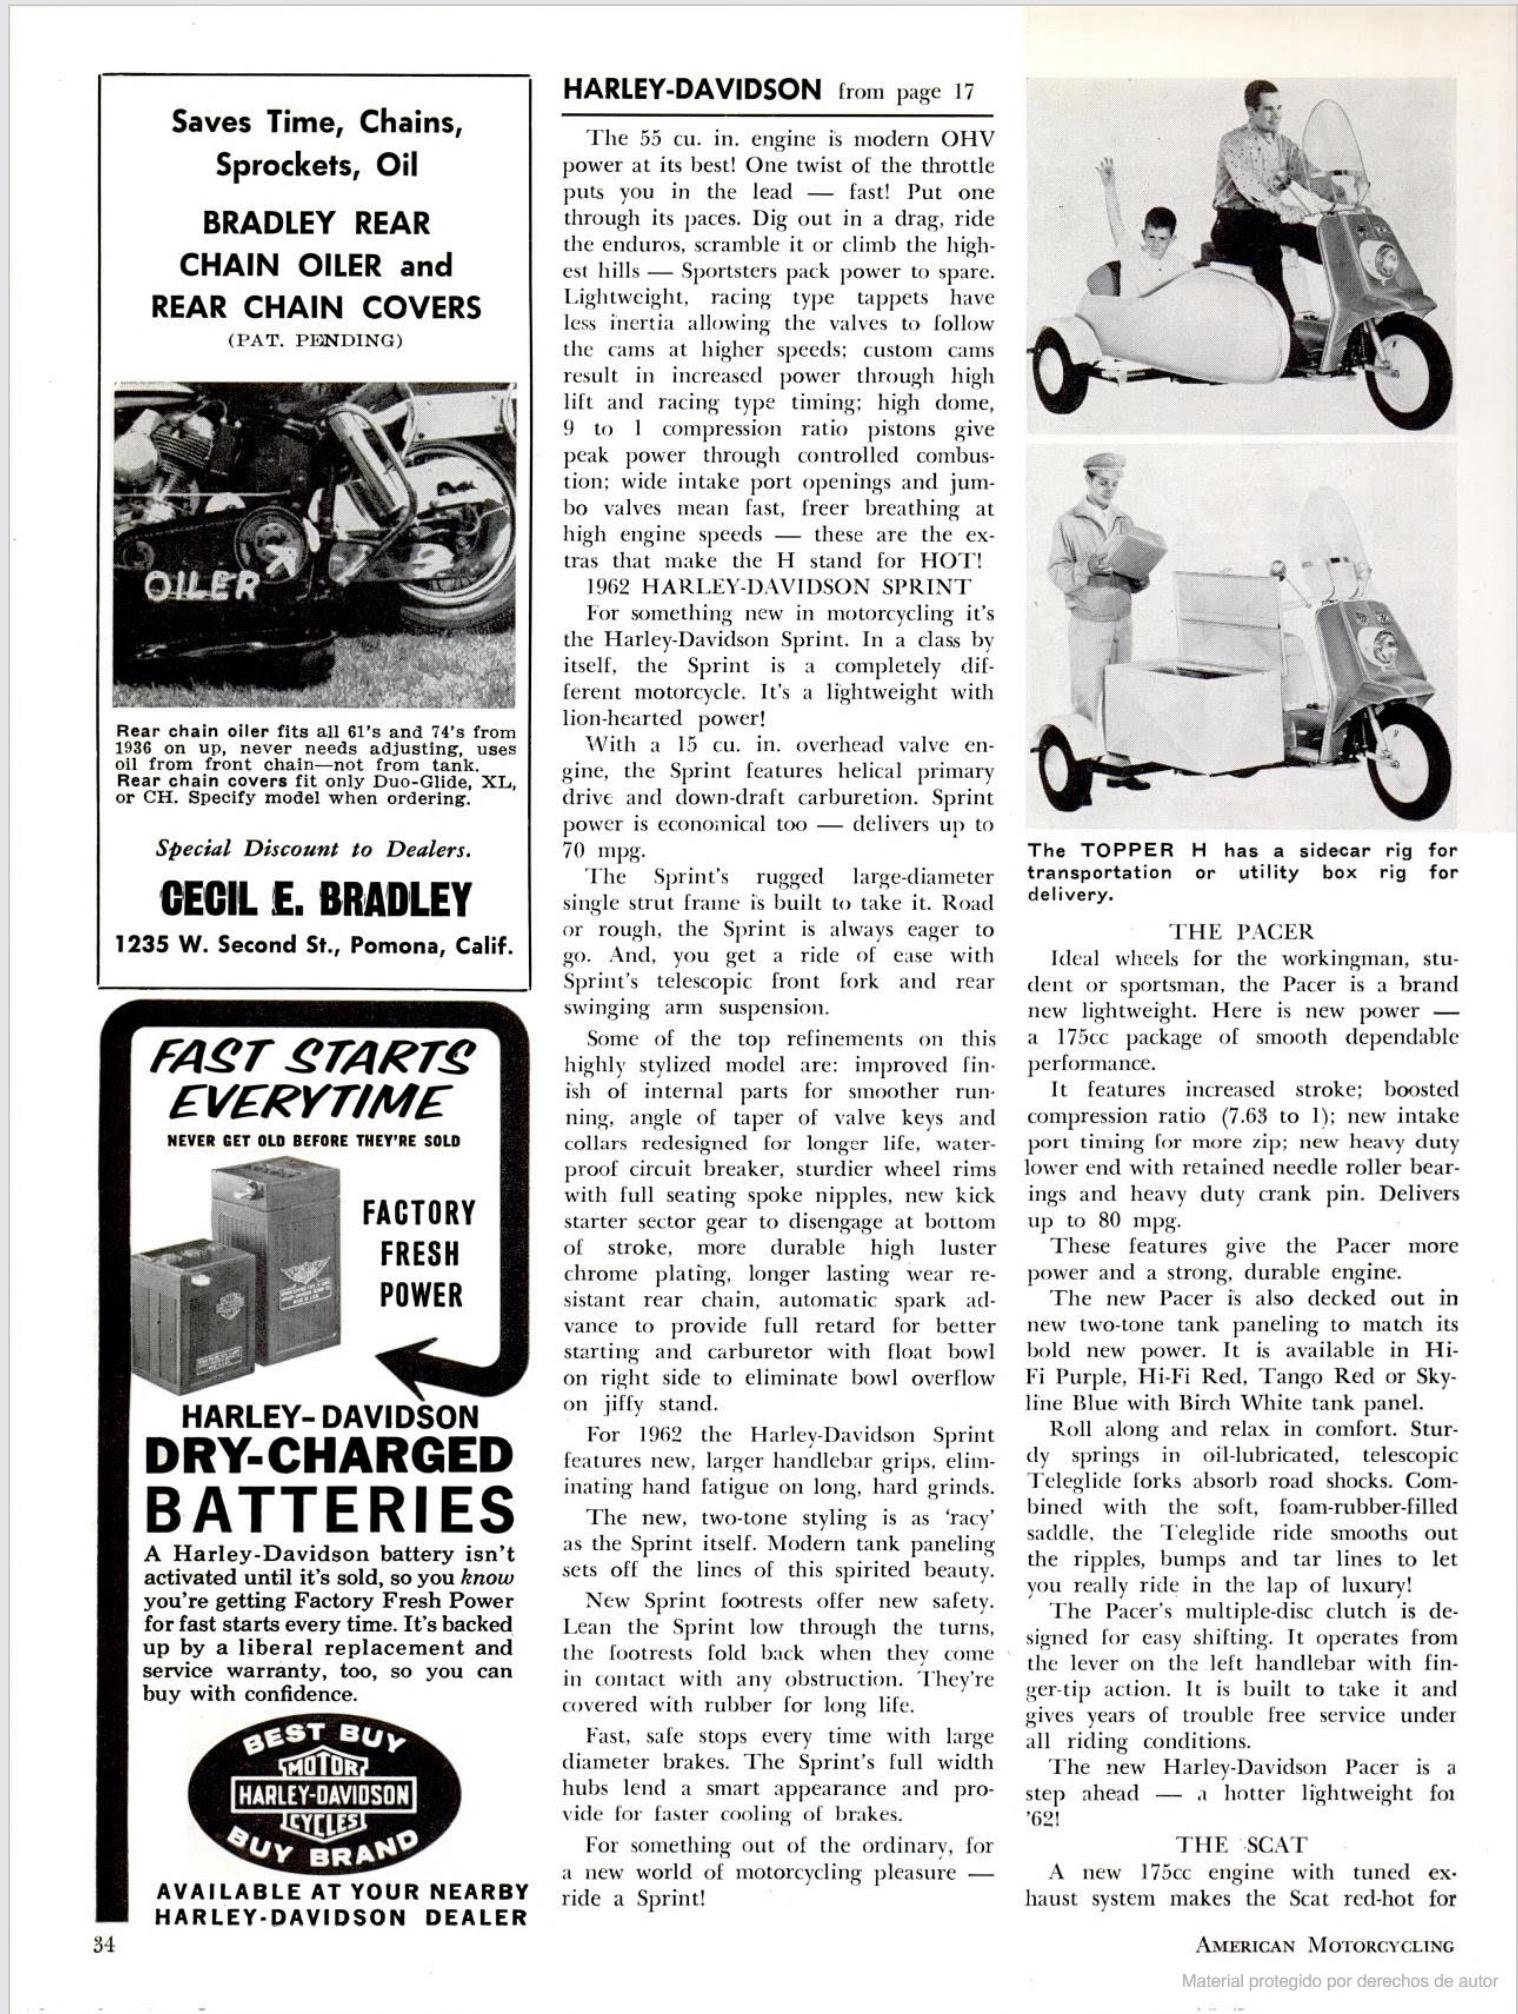 Modelos 1962 - 03